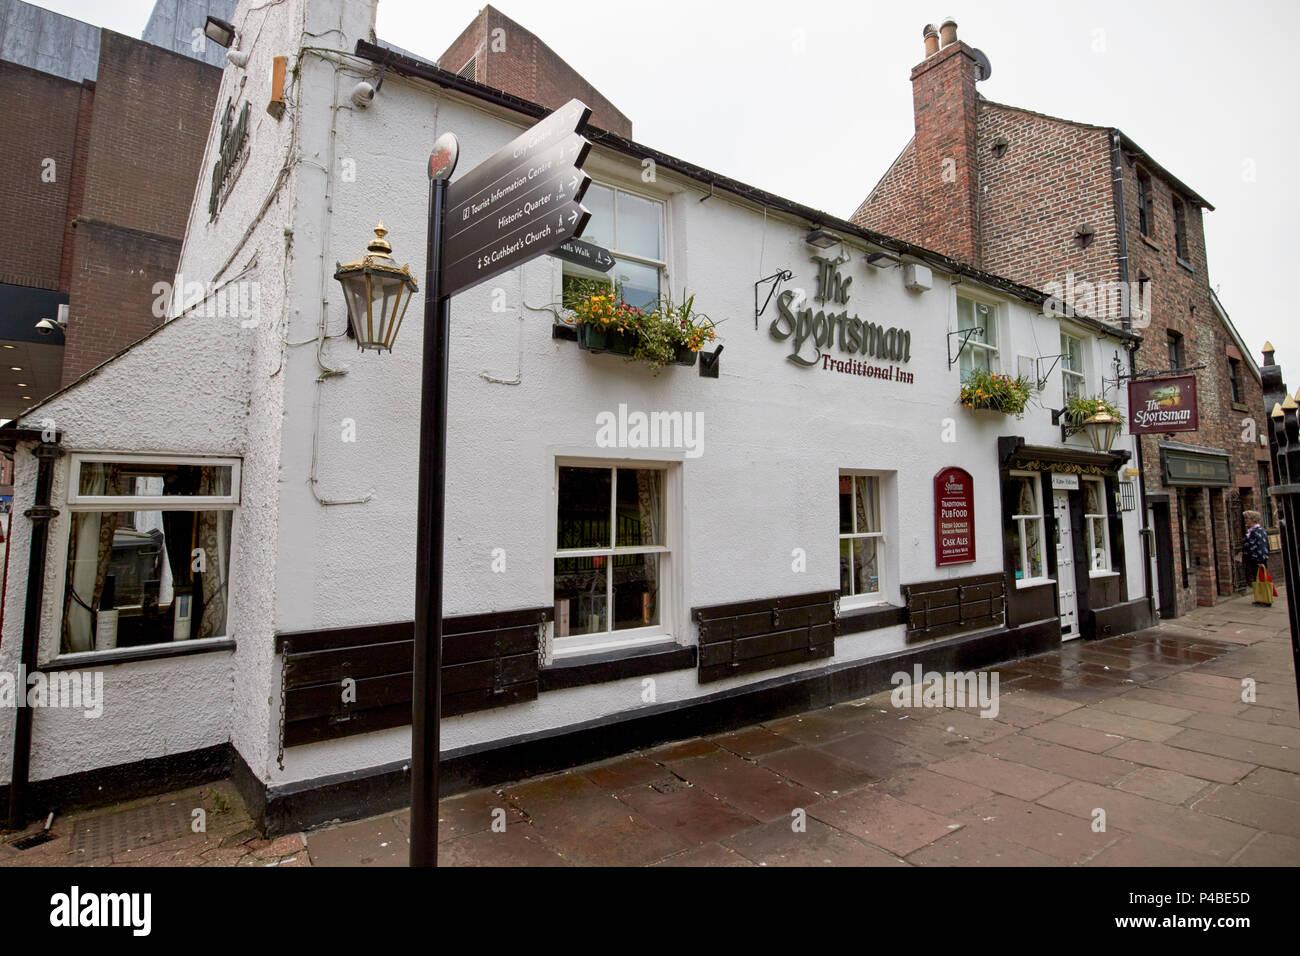 The Sportsman traditional inn Carlisle Cumbria England UK - Stock Image